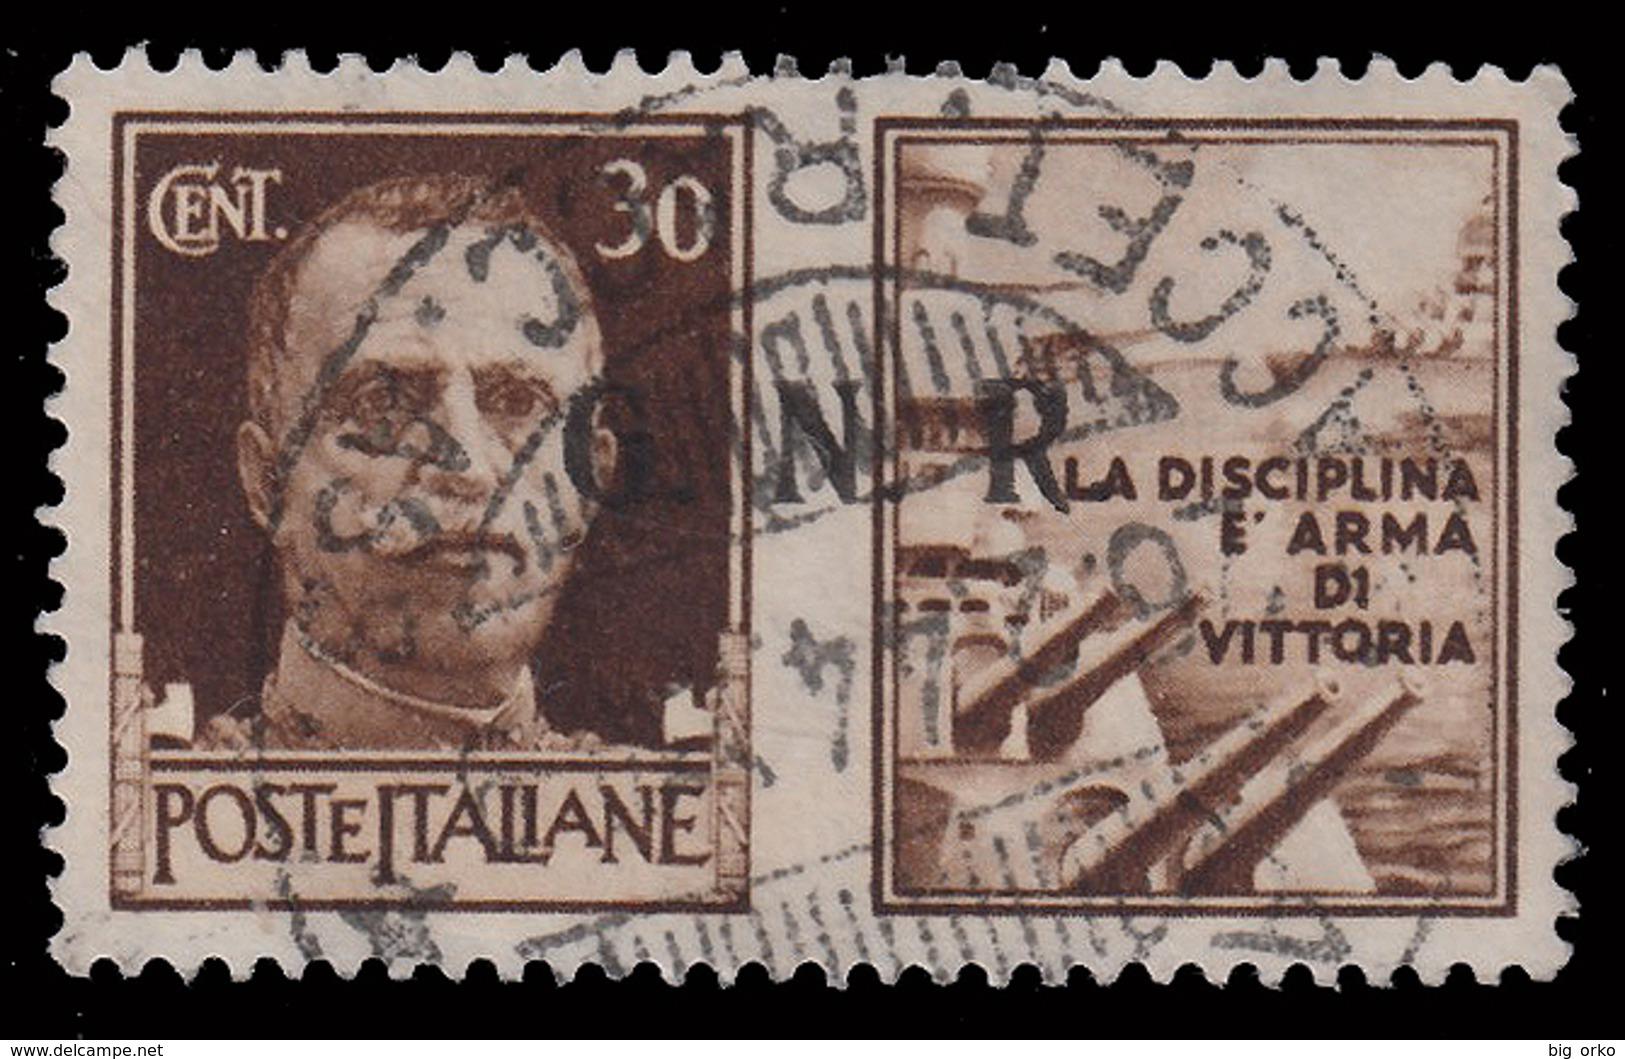 Italia: R.S.I. - PROPAGANDA DI GUERRA / G.N.R.: 30 C. Bruno (I - Marina) - 1944 - Propaganda Di Guerra